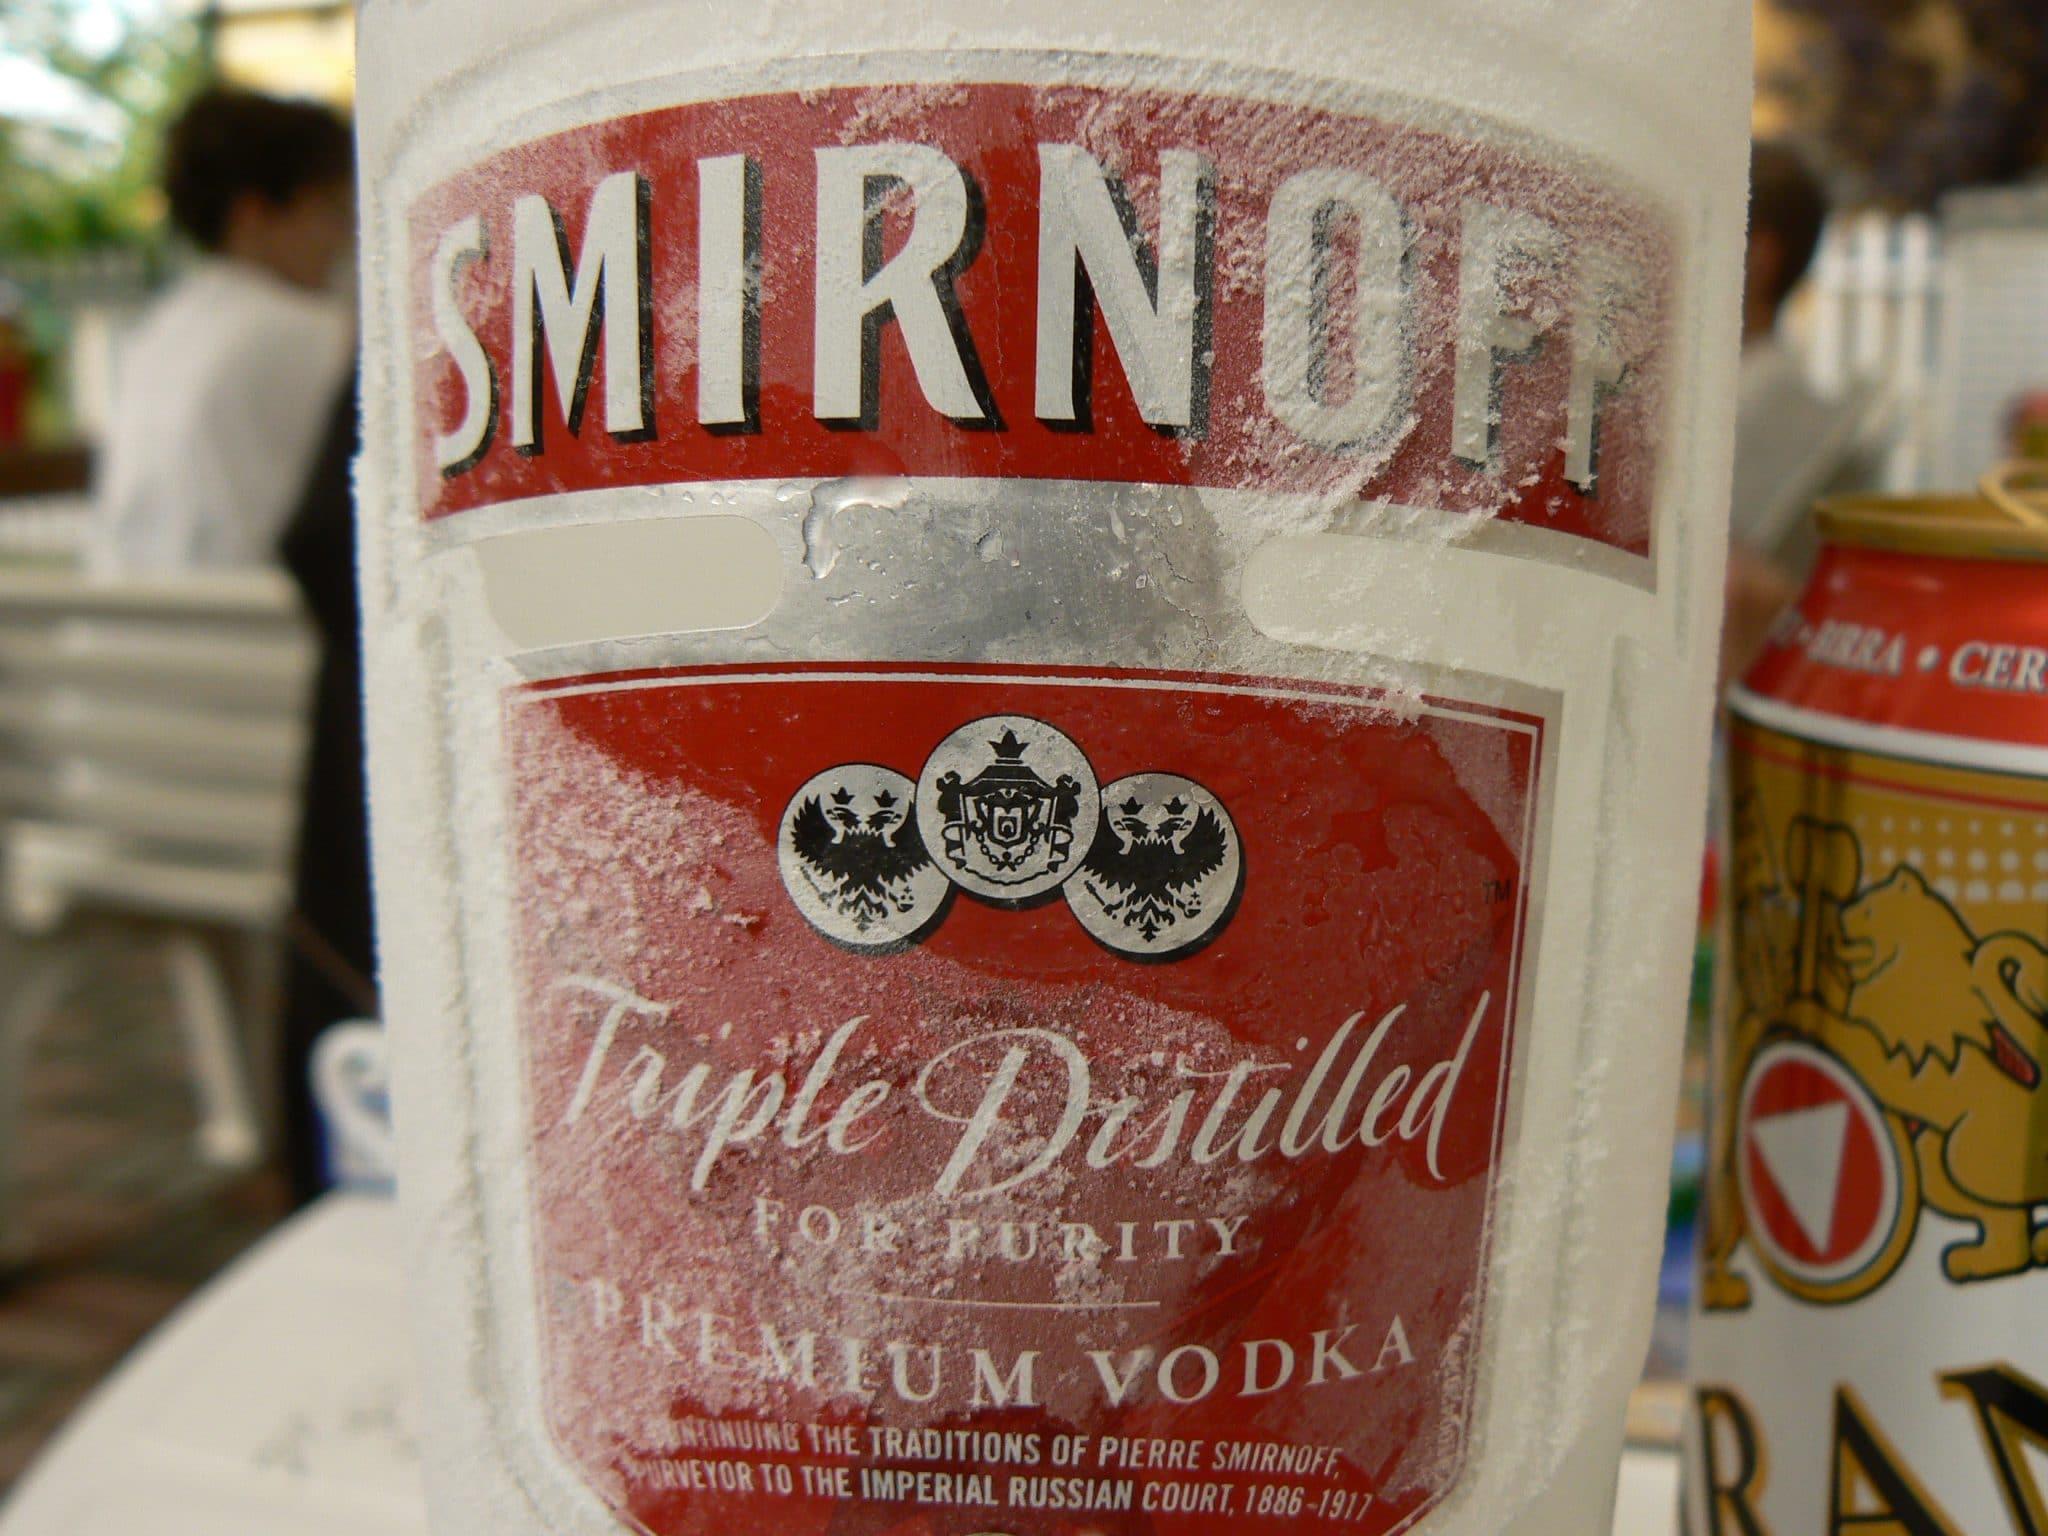 hard drink brands, hard drink bottle, hard drink flavors